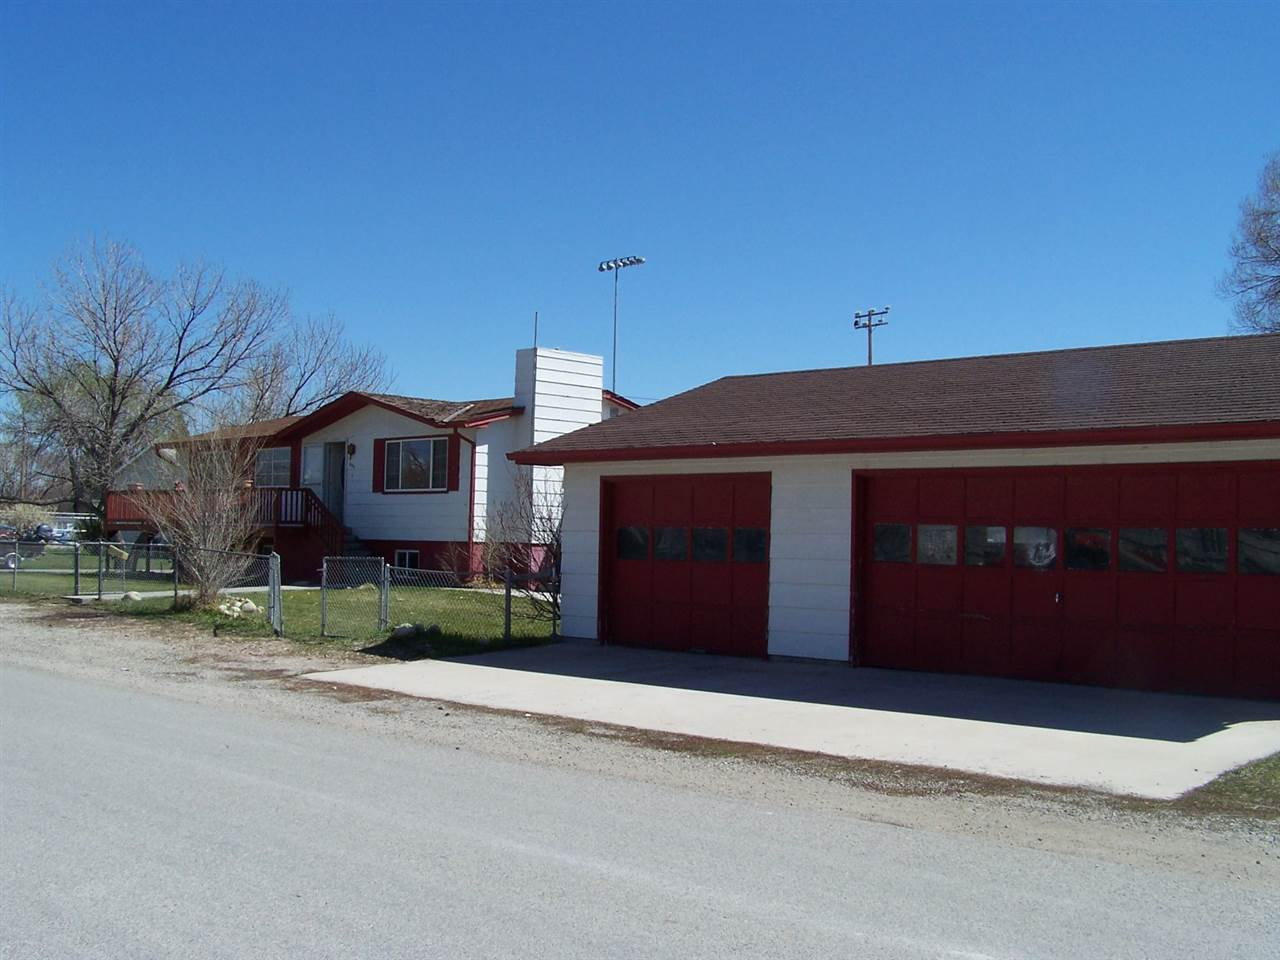 209 4th St, Townsend, MT 59644